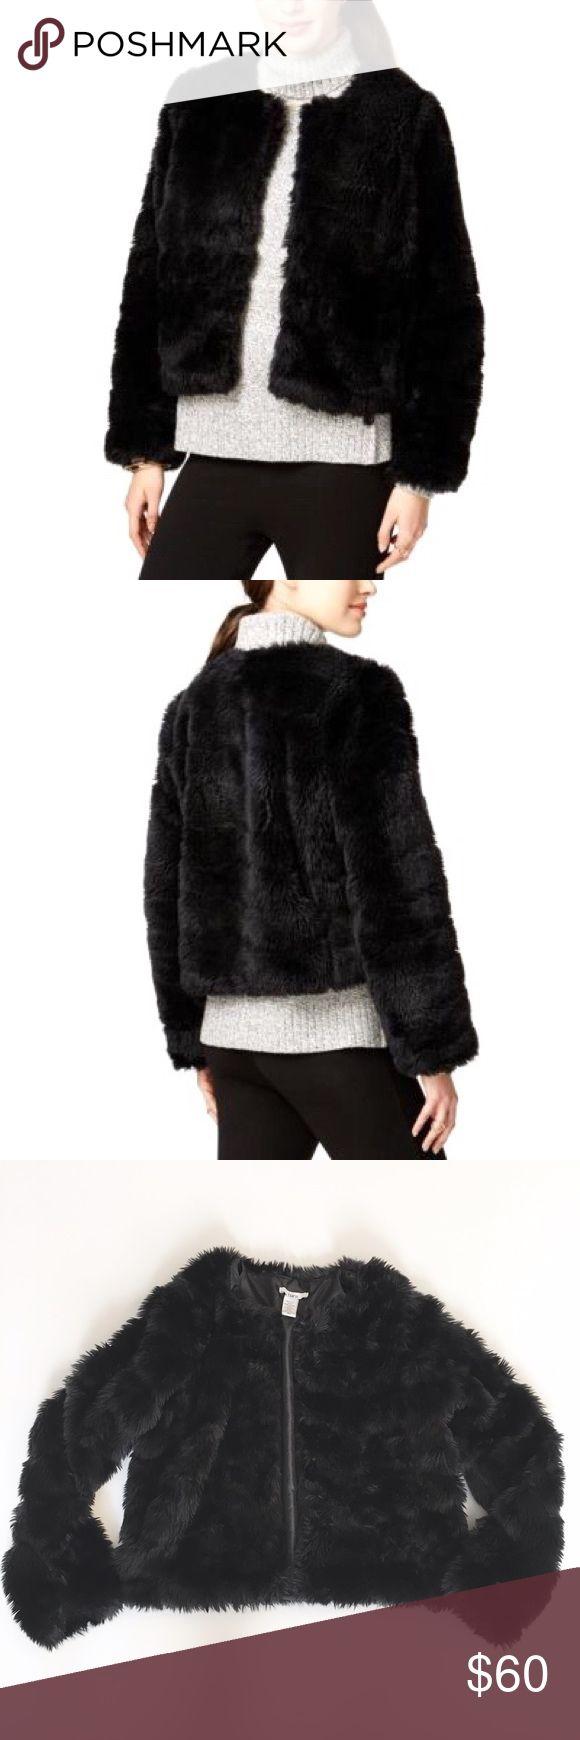 "Bar III black faux fur jacket- size xs Bar III black faux fur jacket. Lined. Approx measurements laying flat: chest - 17.5"", length - 20"". Excellent condition Bar III Jackets & Coats"